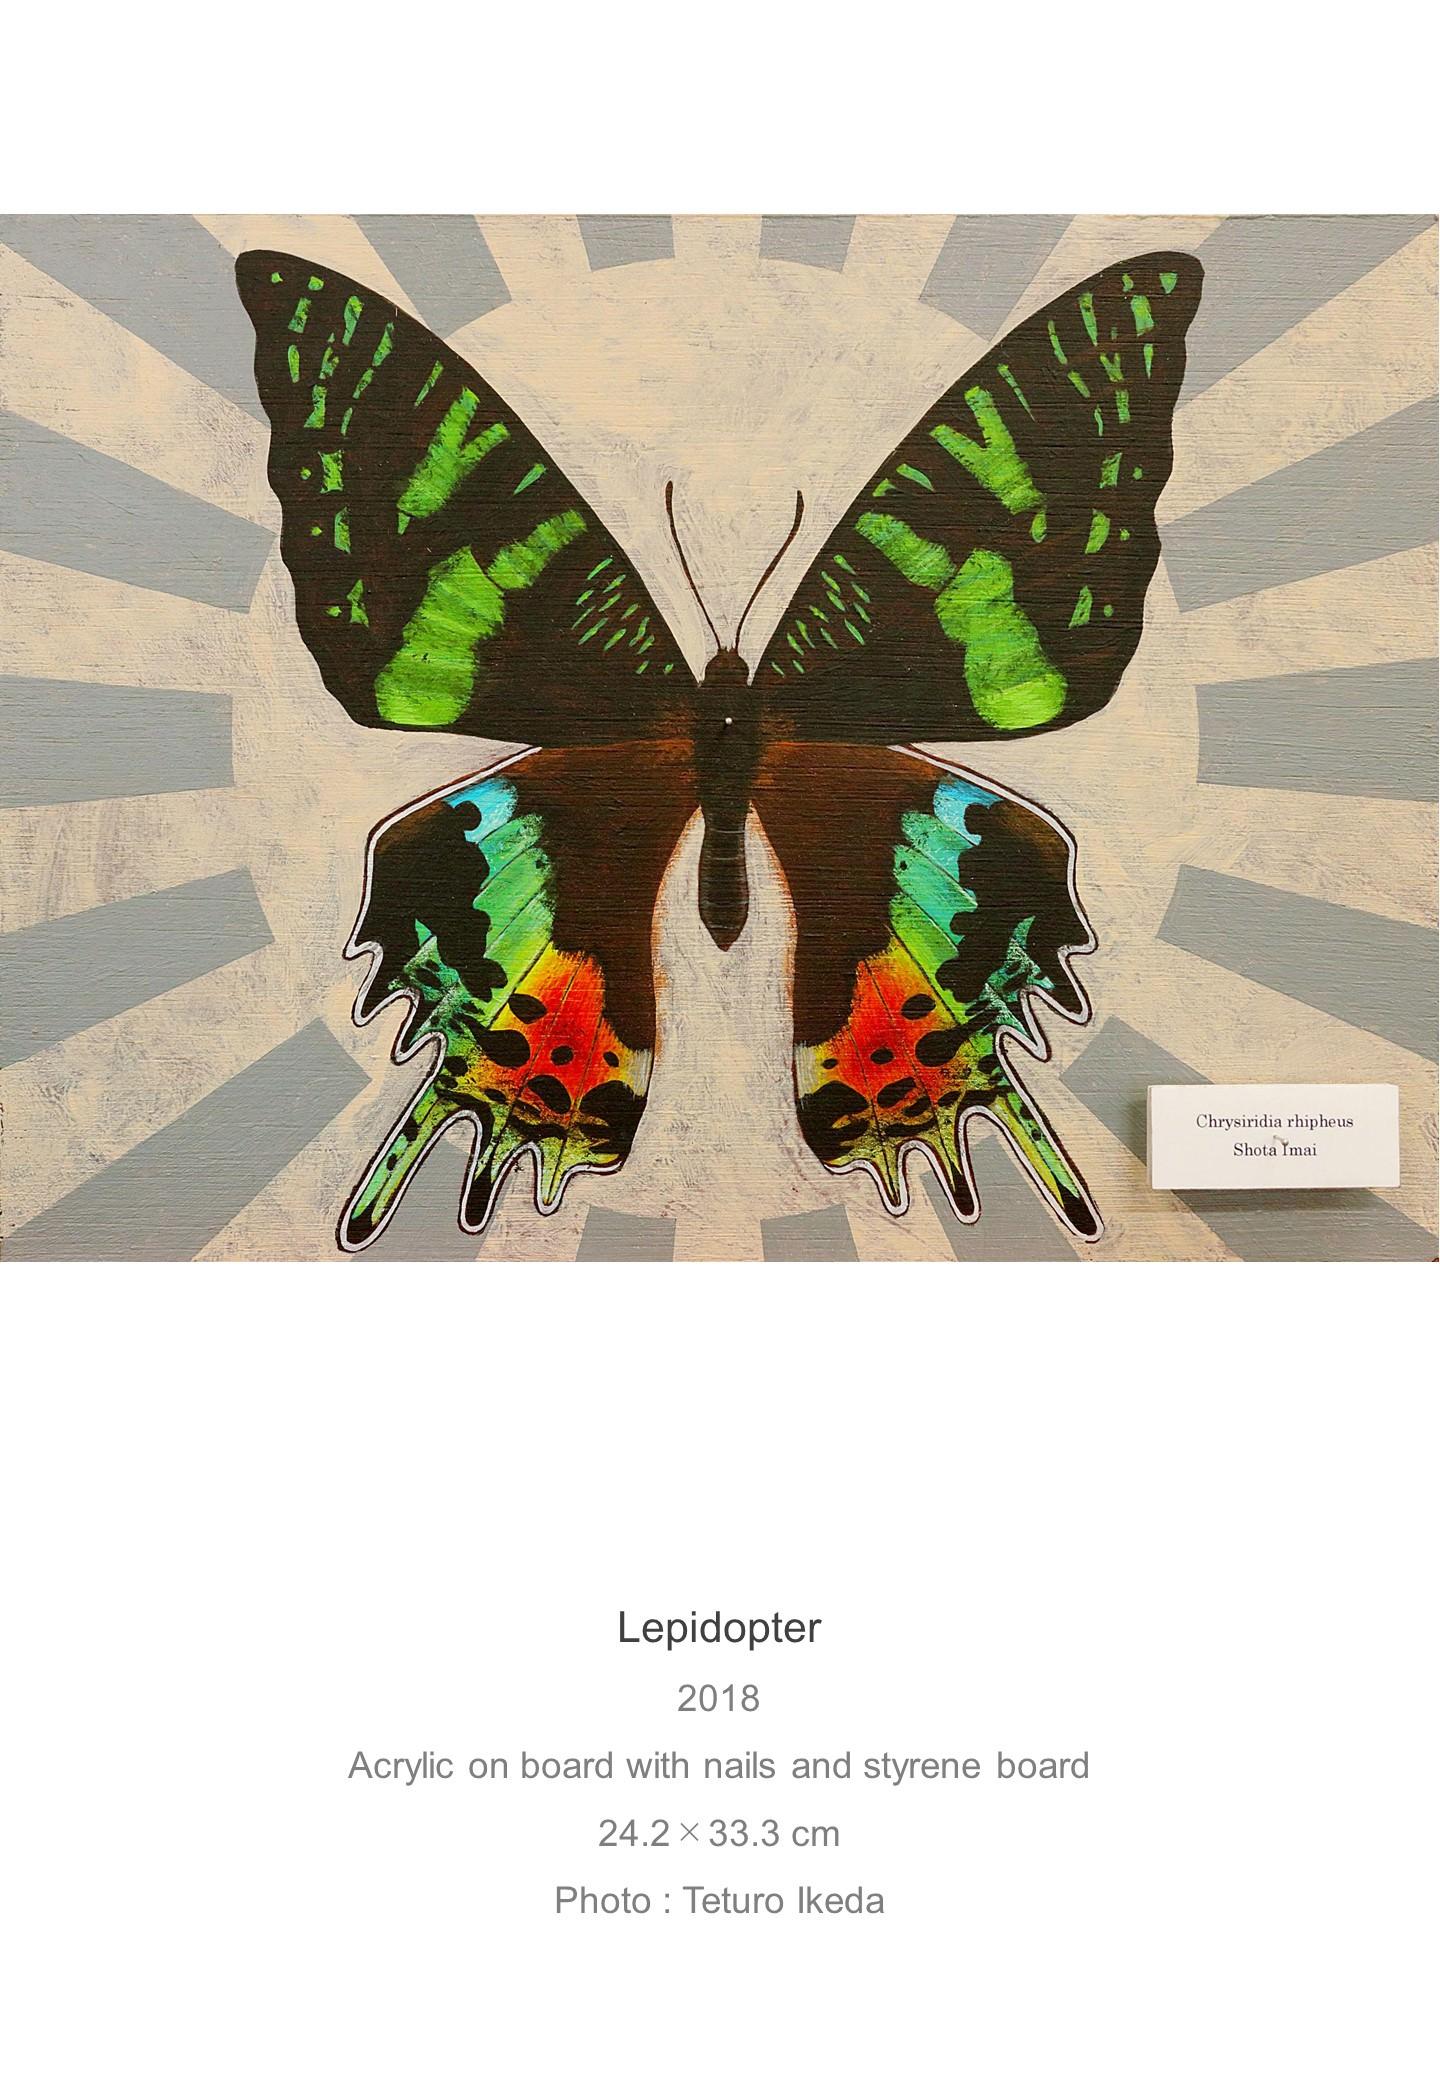 Shota Imai's Artwork of Lepidopter